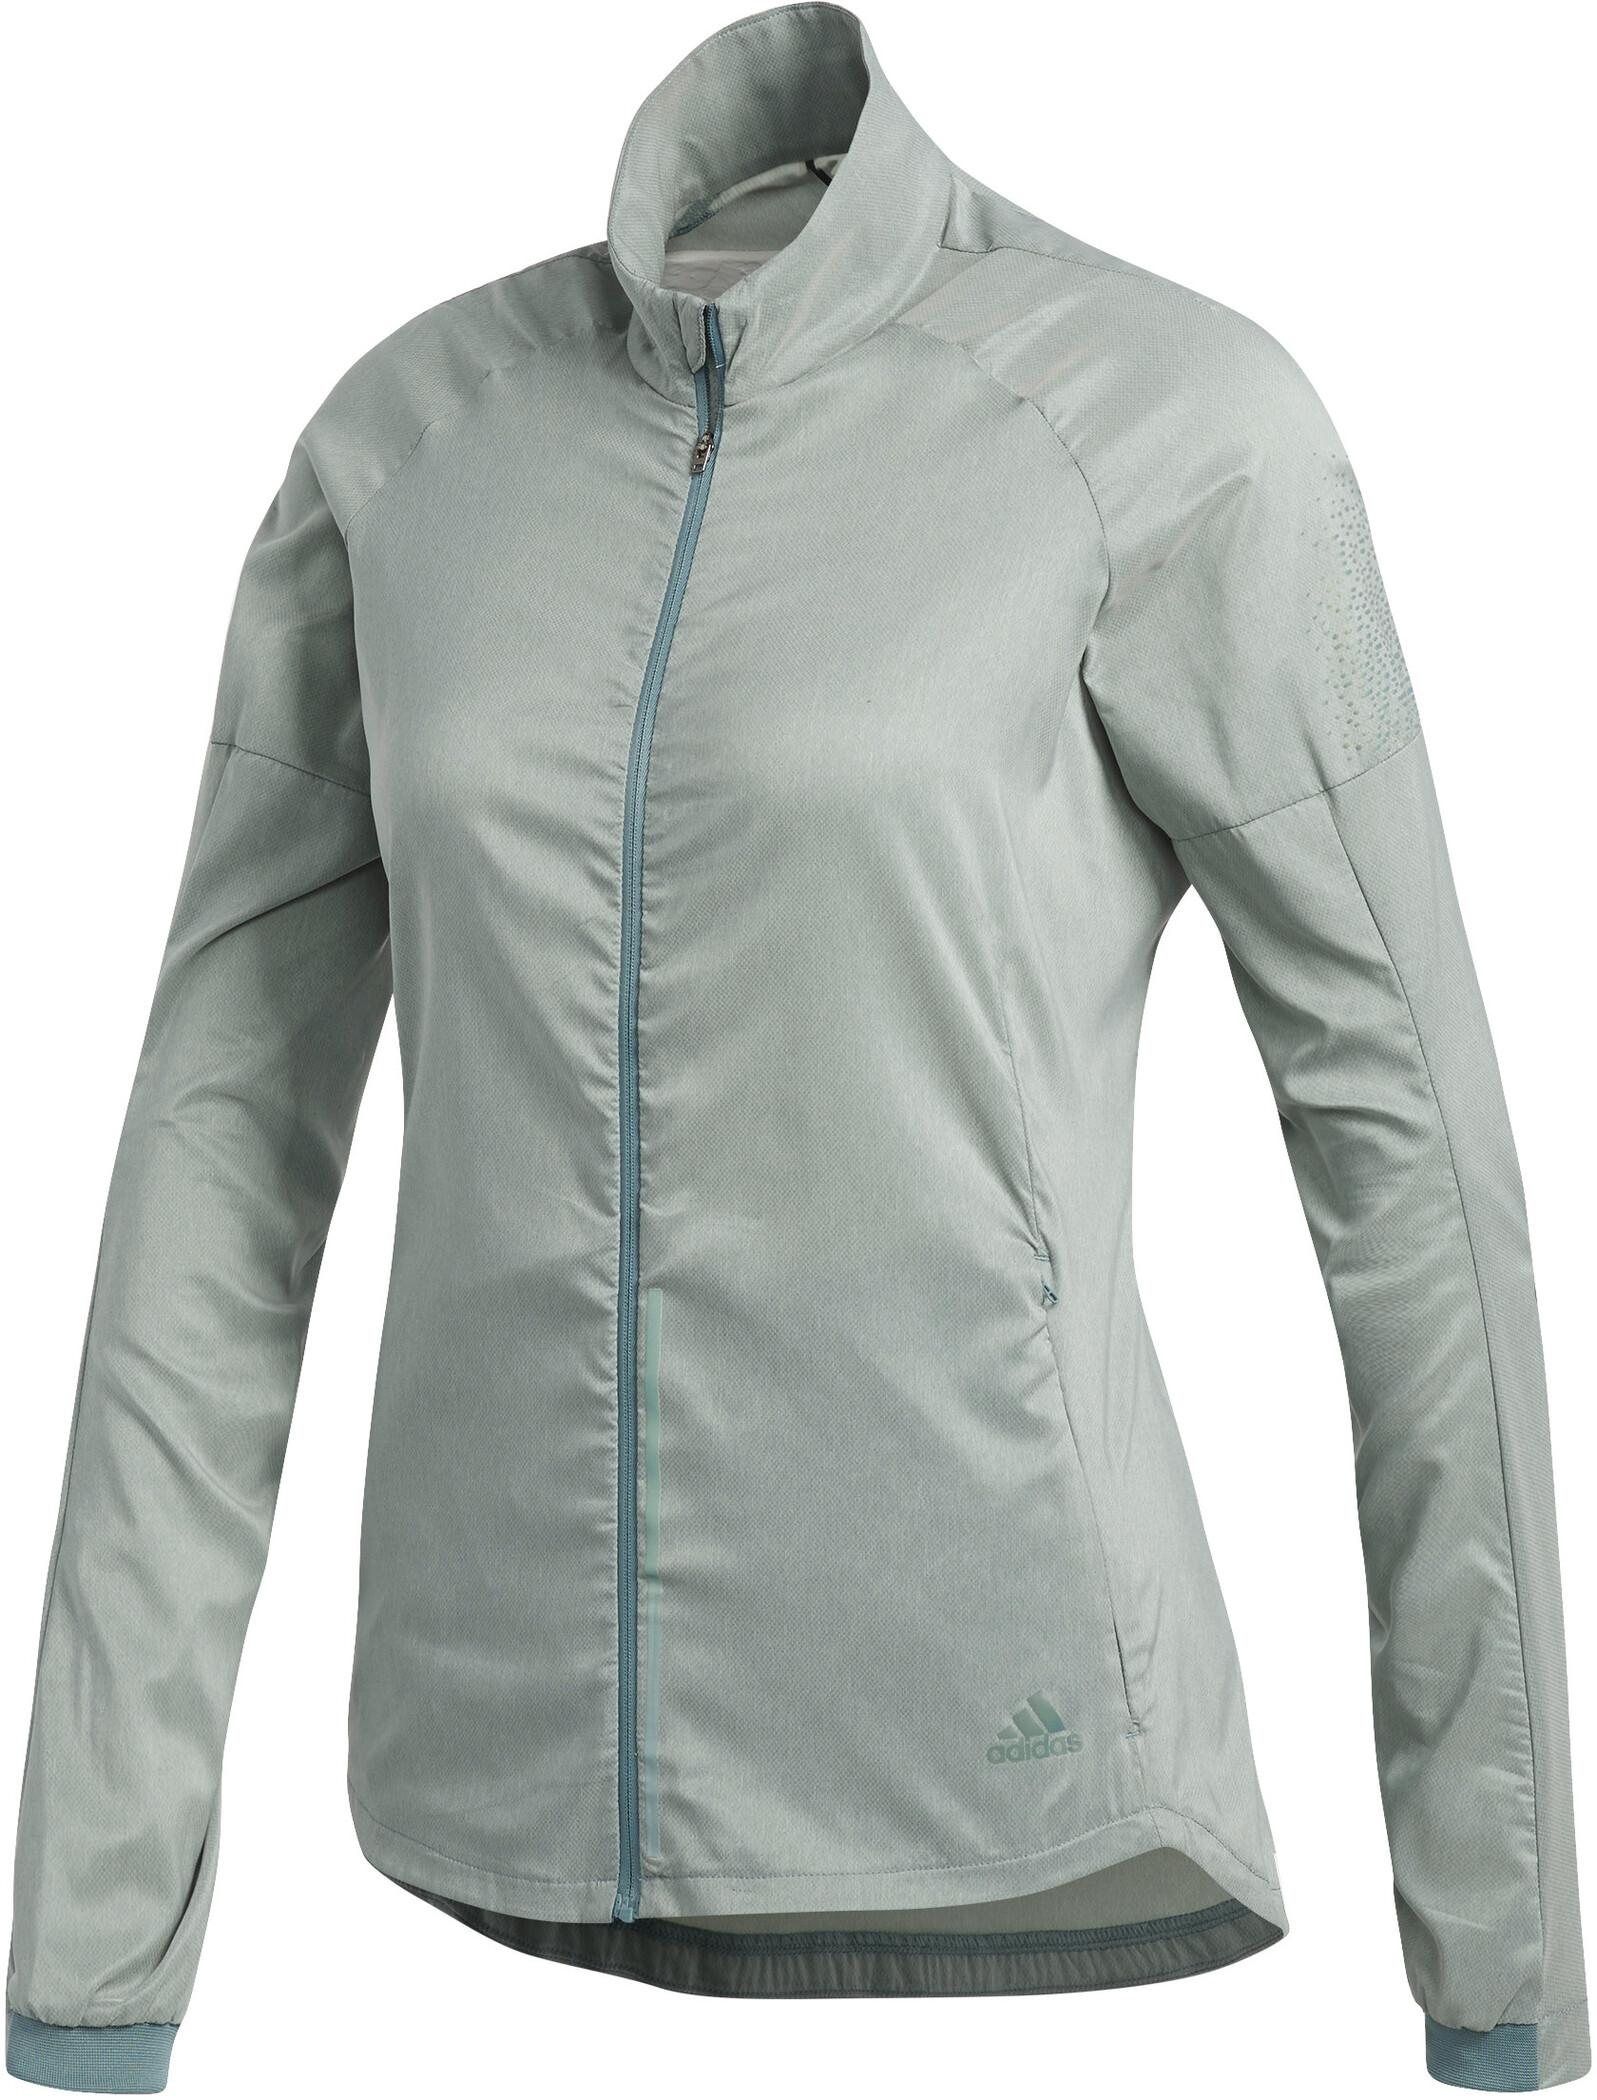 adidas Supernova Confident 3 Season Jacket Women Raw Green Colored Heather .jpg 06be054f0